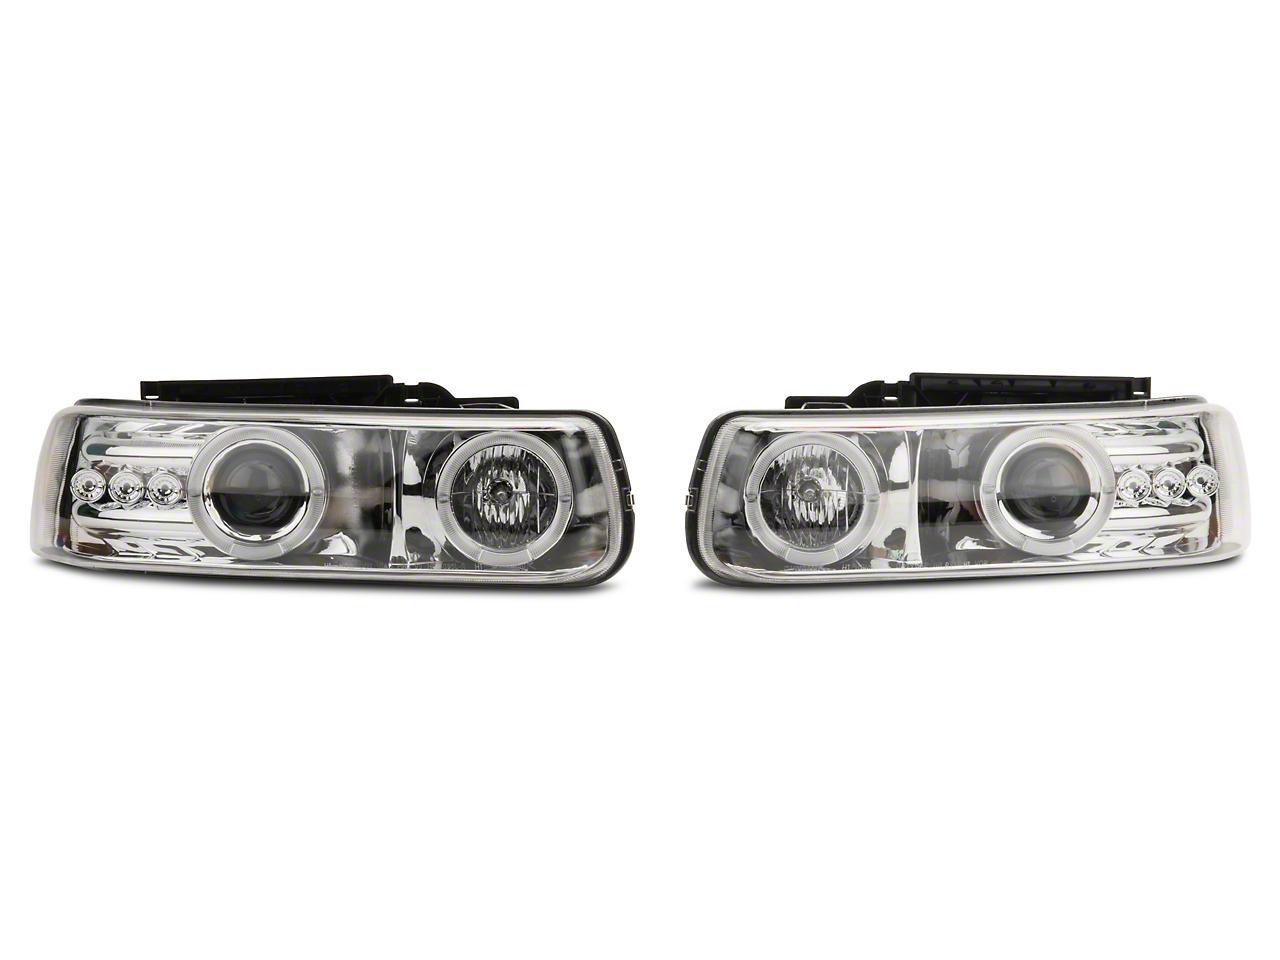 Axial Chrome LED Dual Halo Projector Headlights (99-02 Silverado 1500)